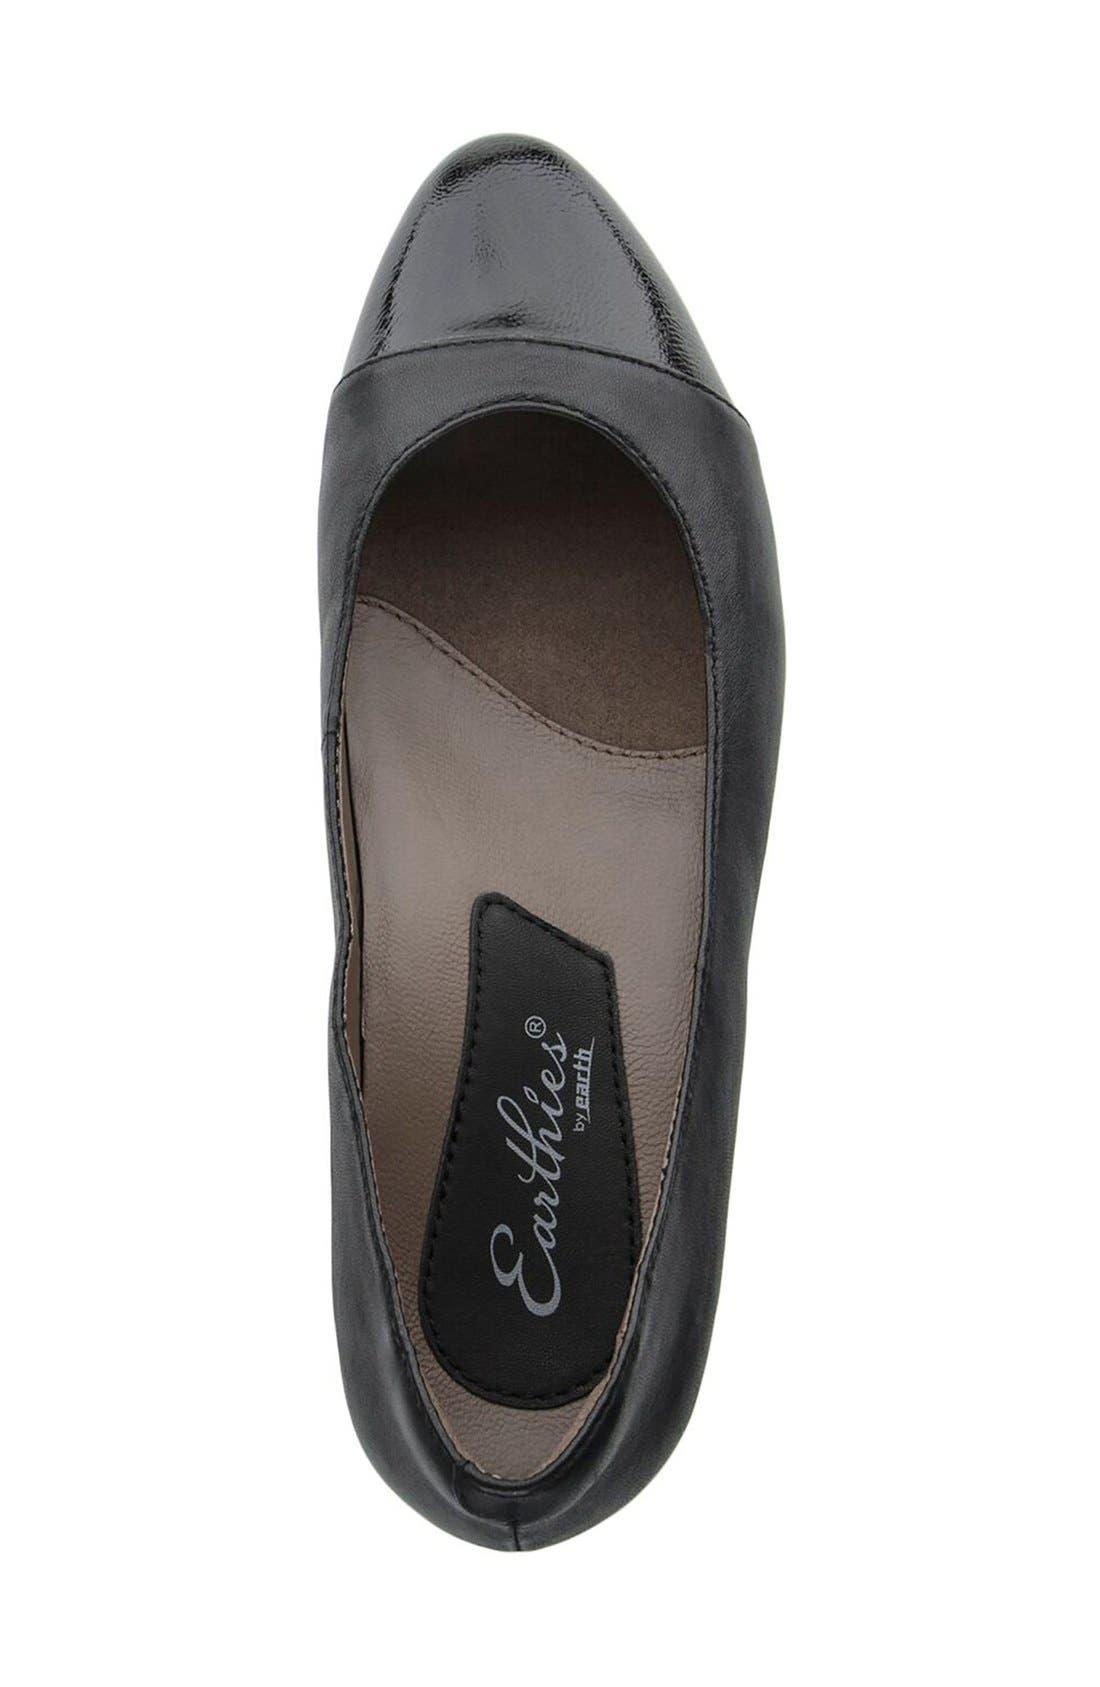 'Hanover' Cap Toe Flat,                             Alternate thumbnail 3, color,                             Black Leather